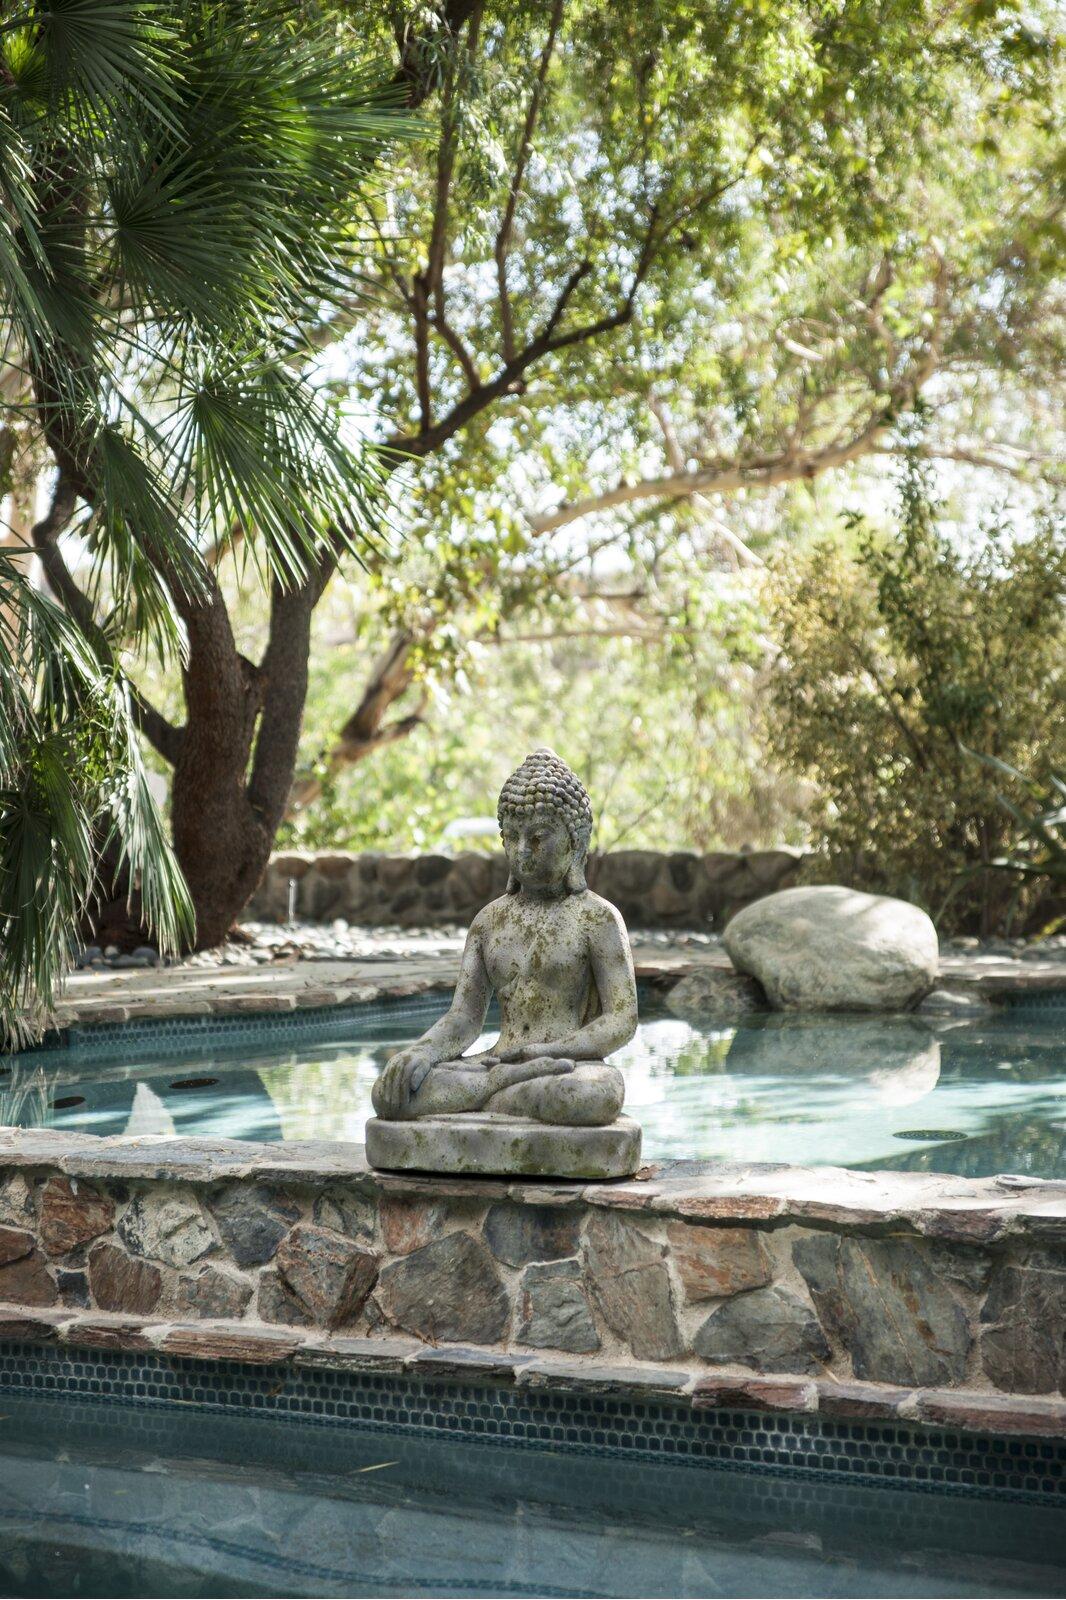 outdoor-buddha-statue-30-inch-design-for-medium-size-gardens-poolside-garden-meditation-area-unique-housewarming-gift-idea